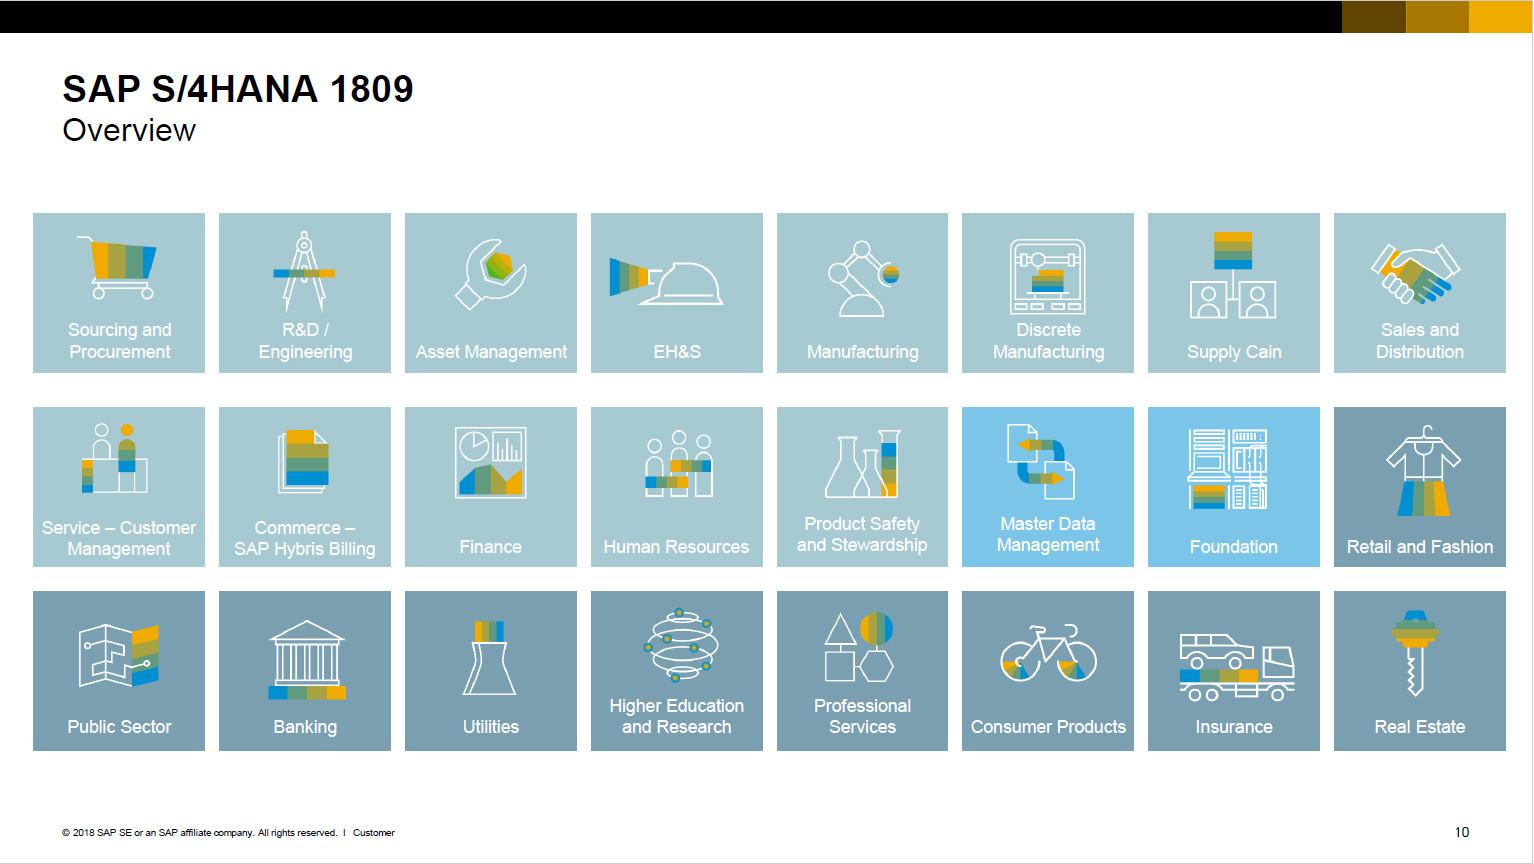 SAP S/4HANA - Release 1809